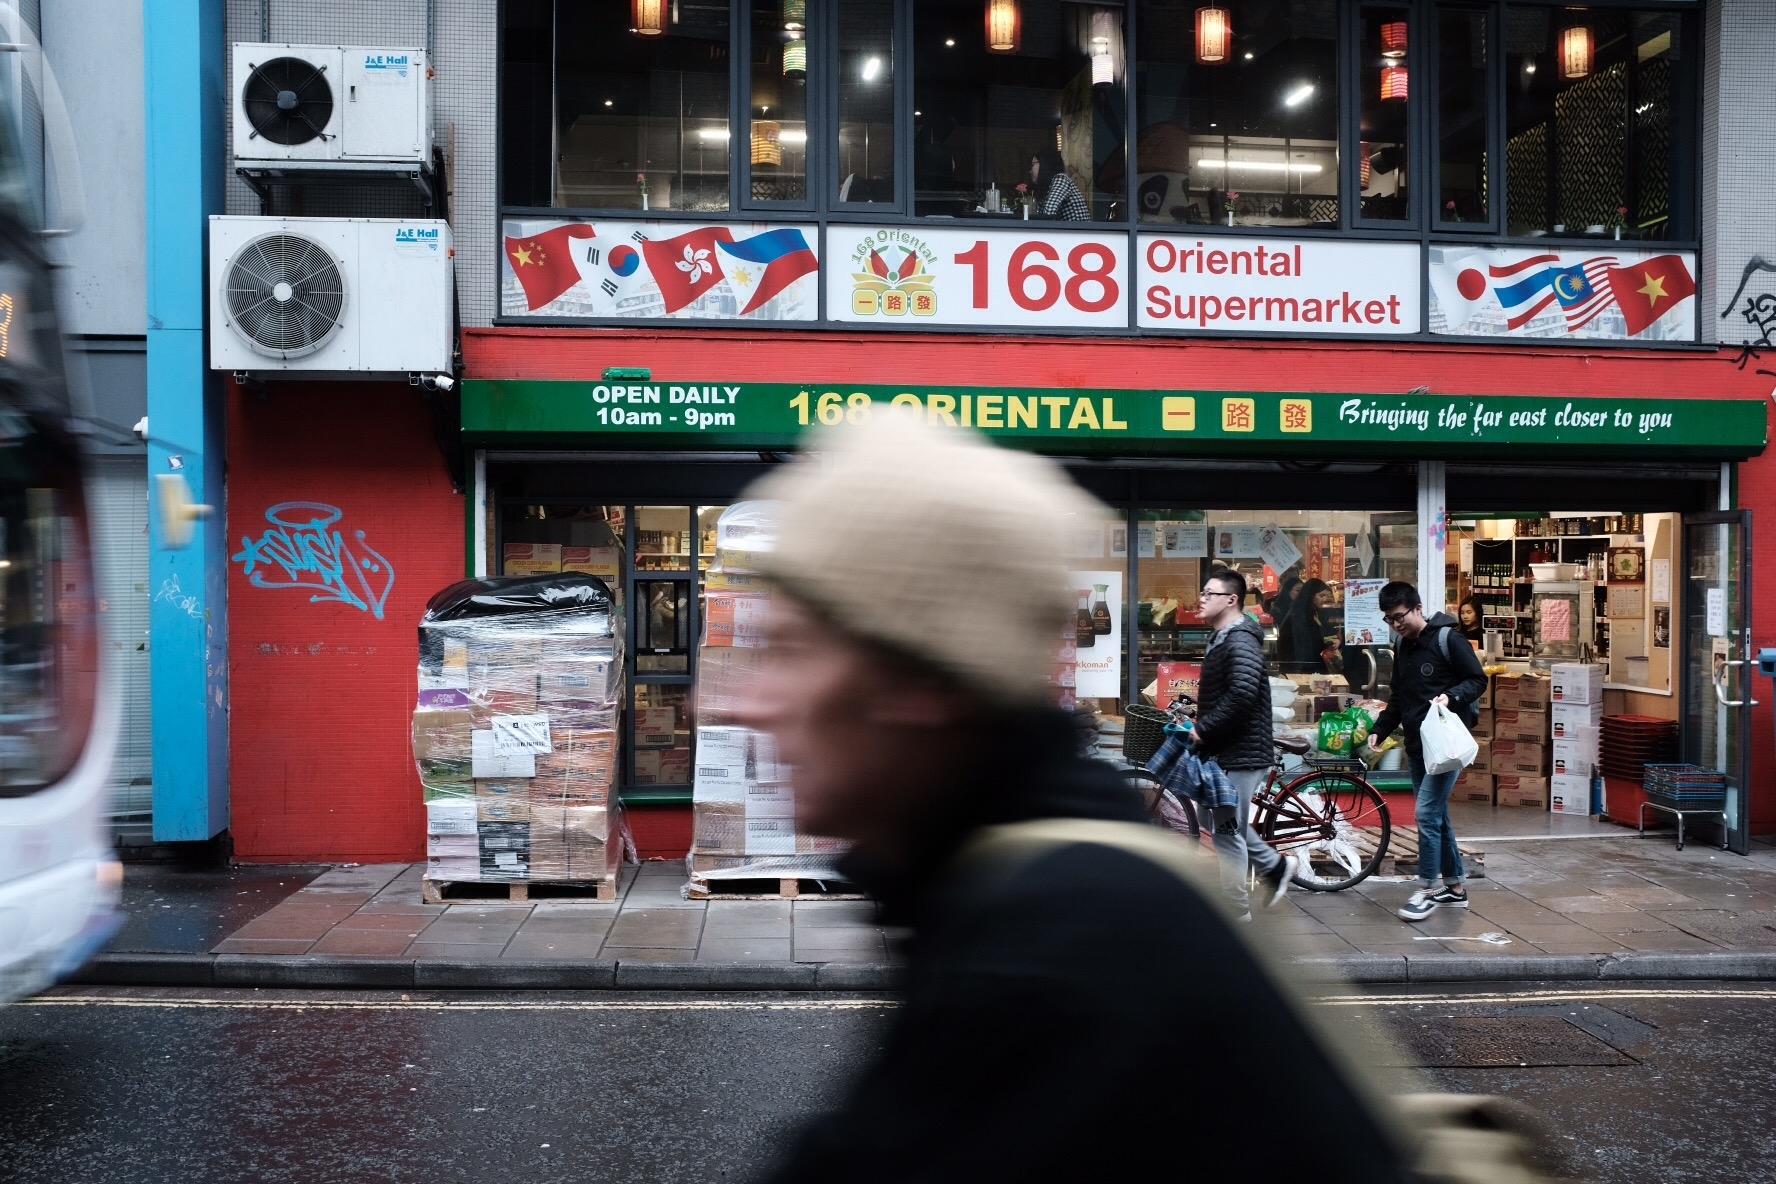 Alex-Sedgmond-Photography-Cardiff-Bristol-StreetPhotography-LittleChinaTown.JPG